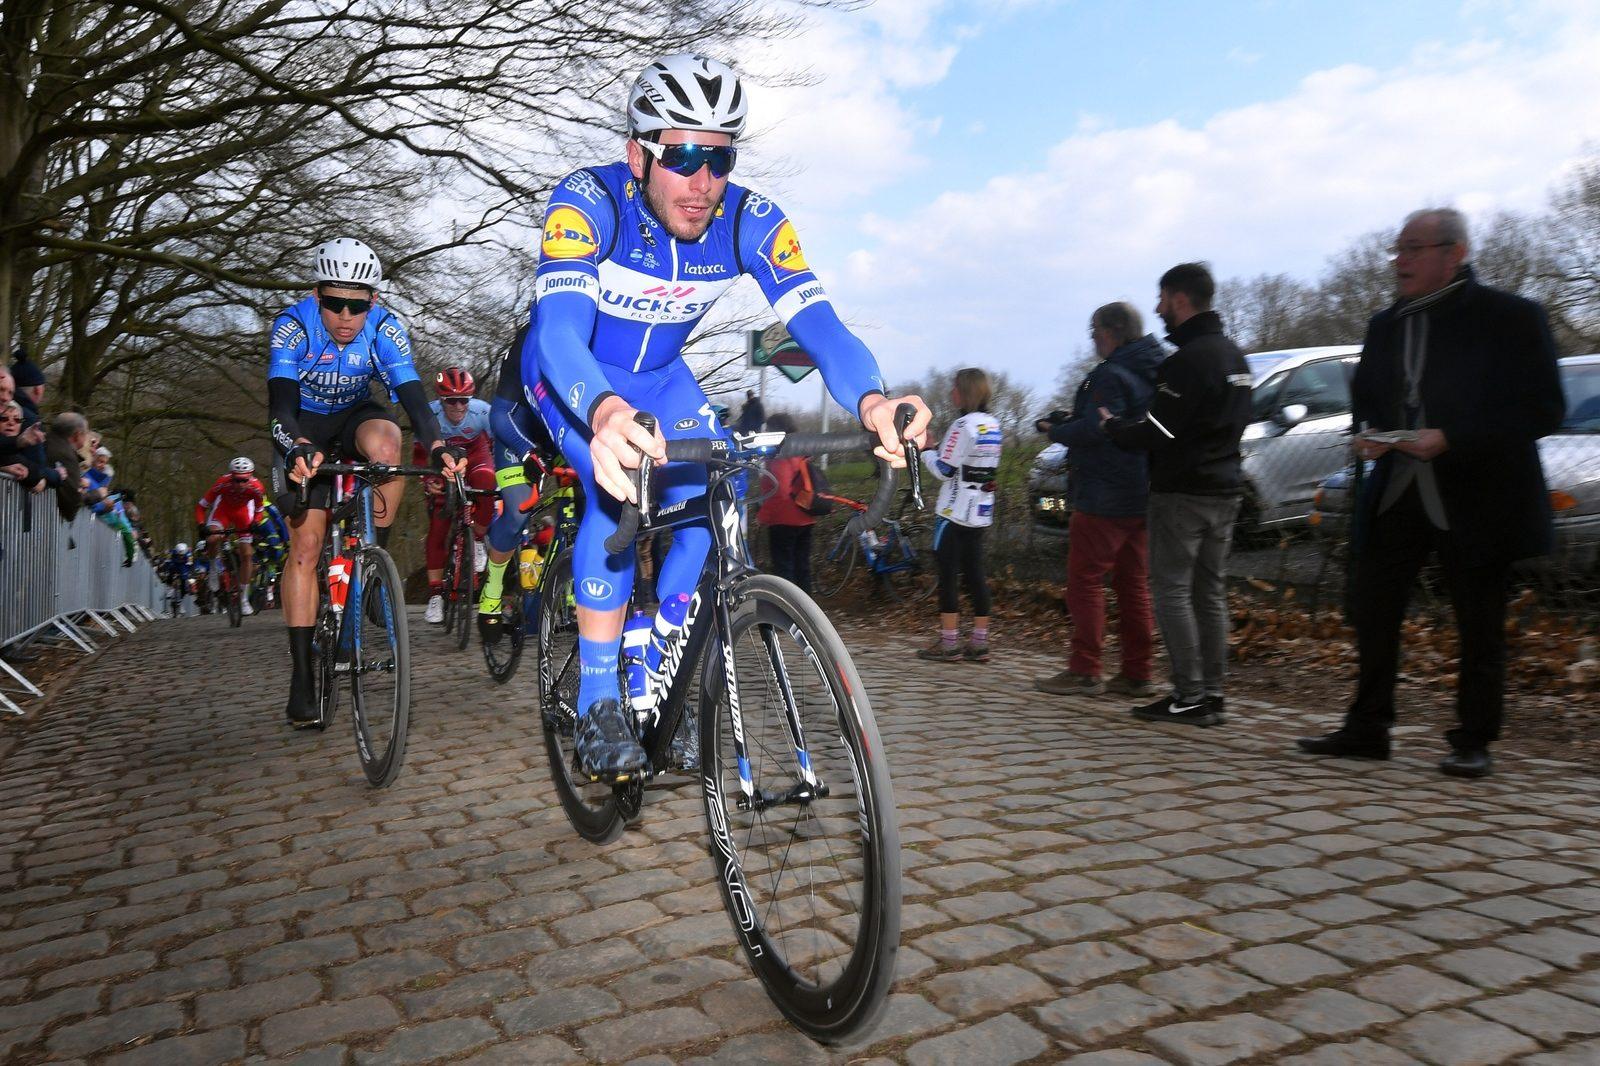 Элиа Вивиани выиграл велогонку Driedaagse Brugge— De Panne